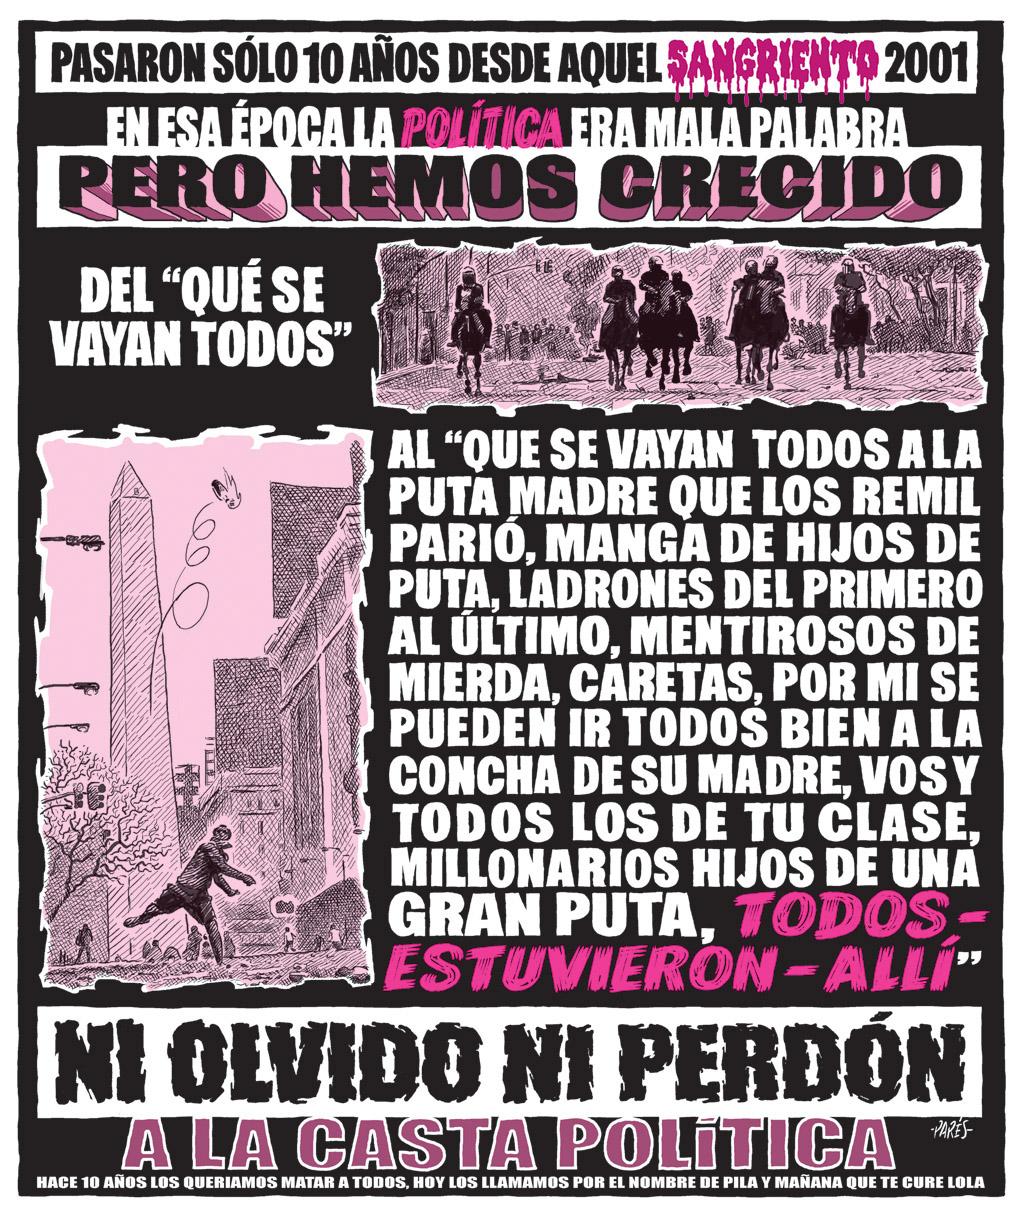 http://1.bp.blogspot.com/-bt77MZ3DXeY/Tr4dwUHaUMI/AAAAAAAADOY/4kTP6vK2EX0/s1600/barcelona+237.jpg